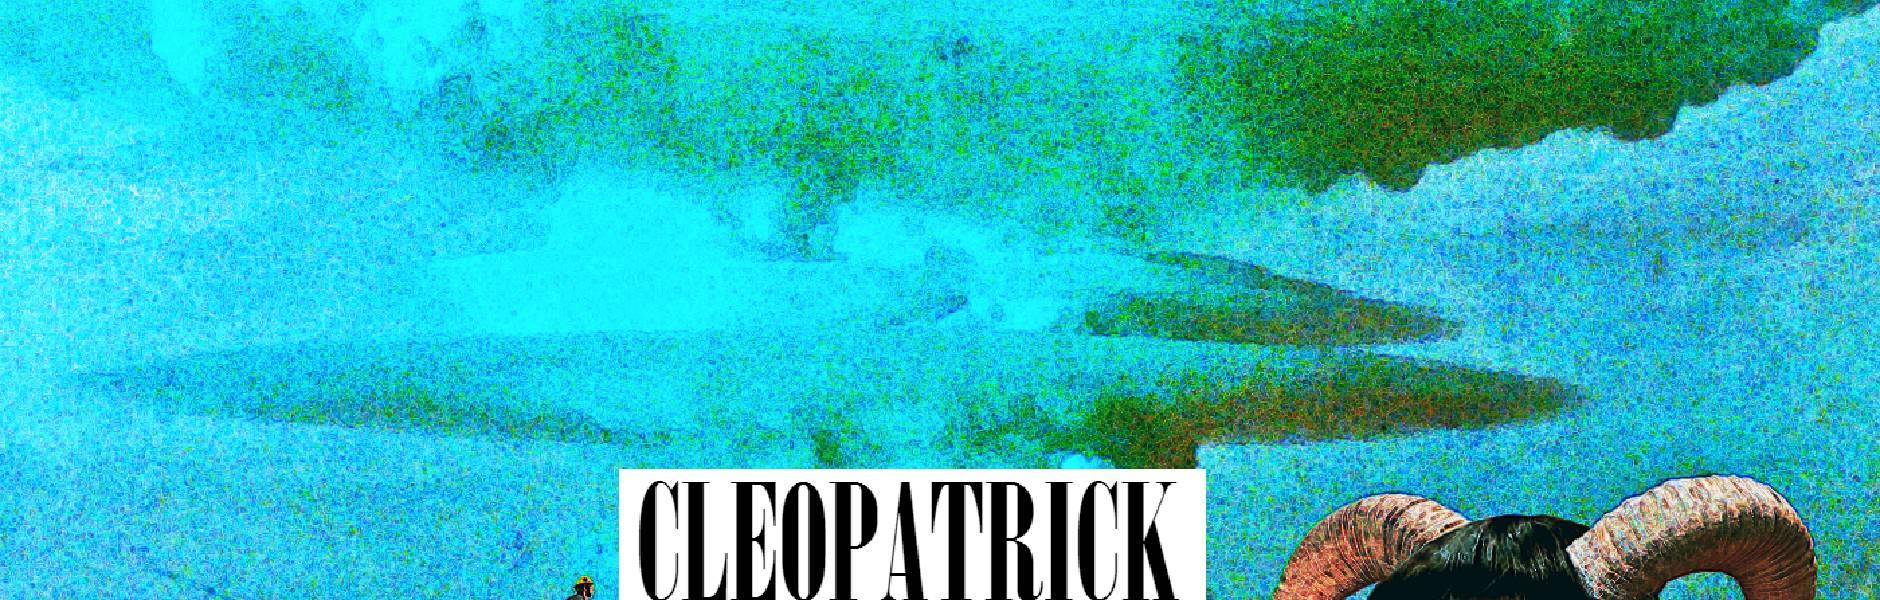 Cleopatrick